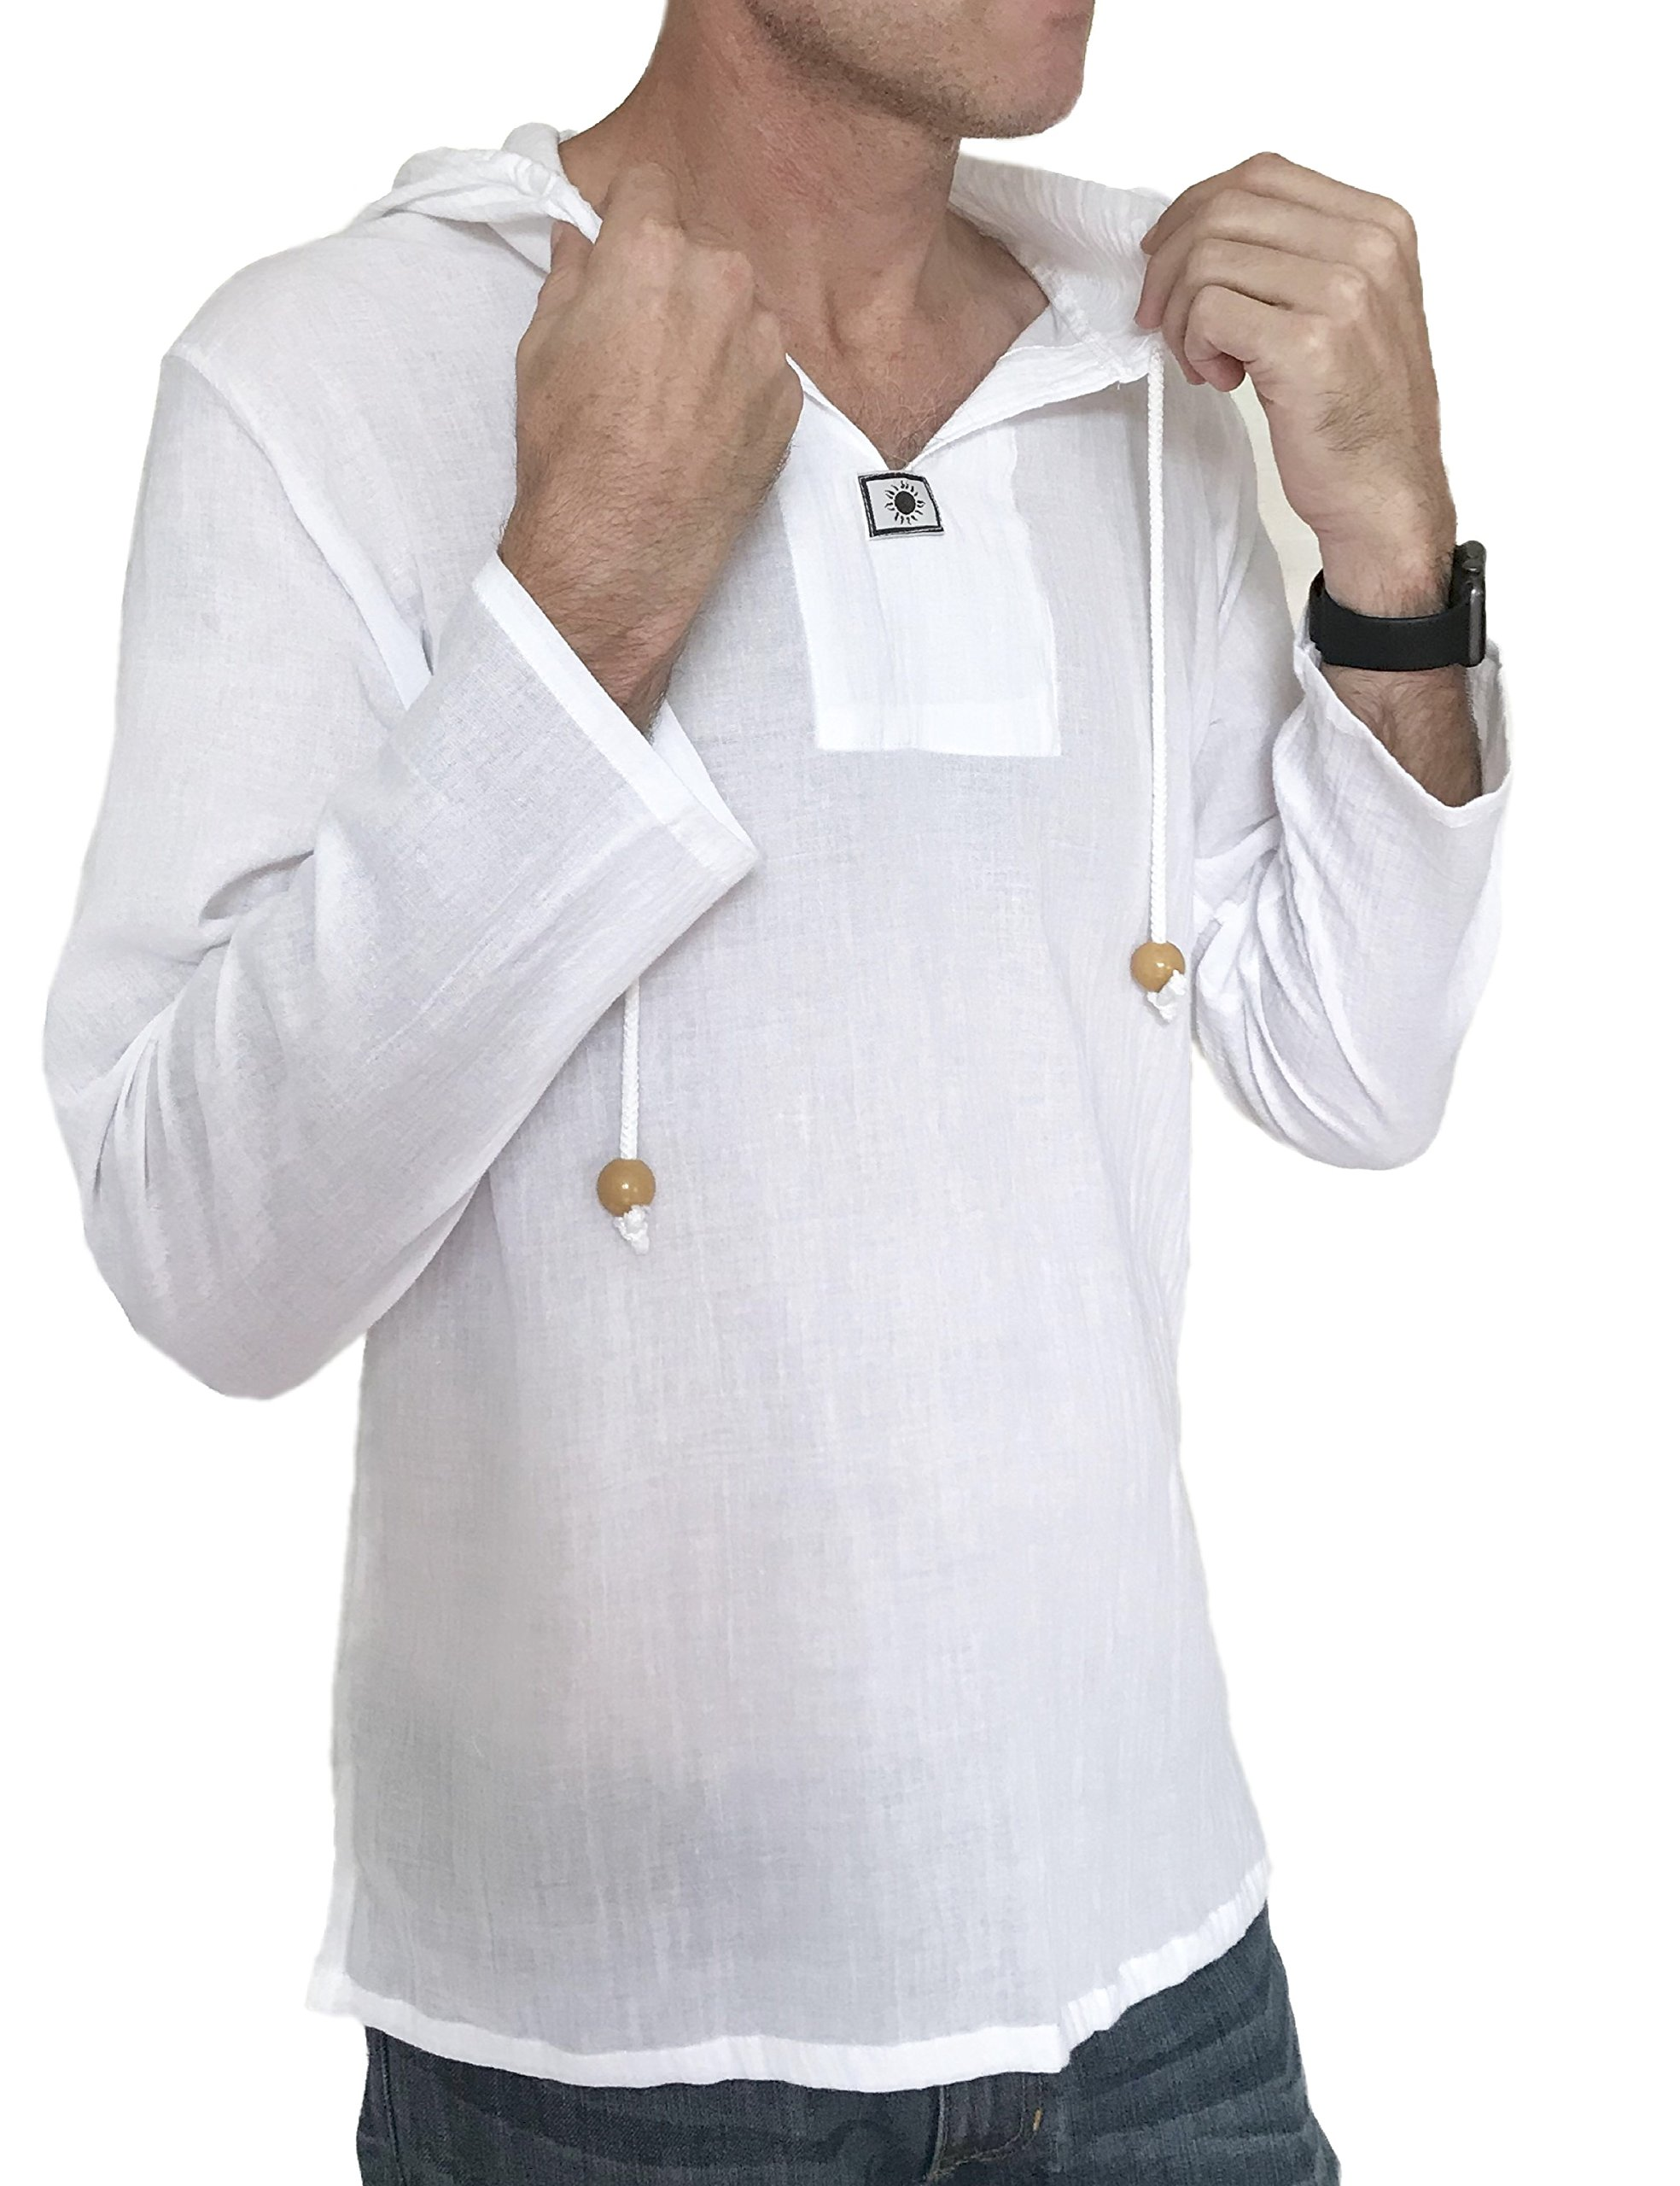 Men's Sun Hoodie Hippie Shirt 100% Cotton Top (Large, White)